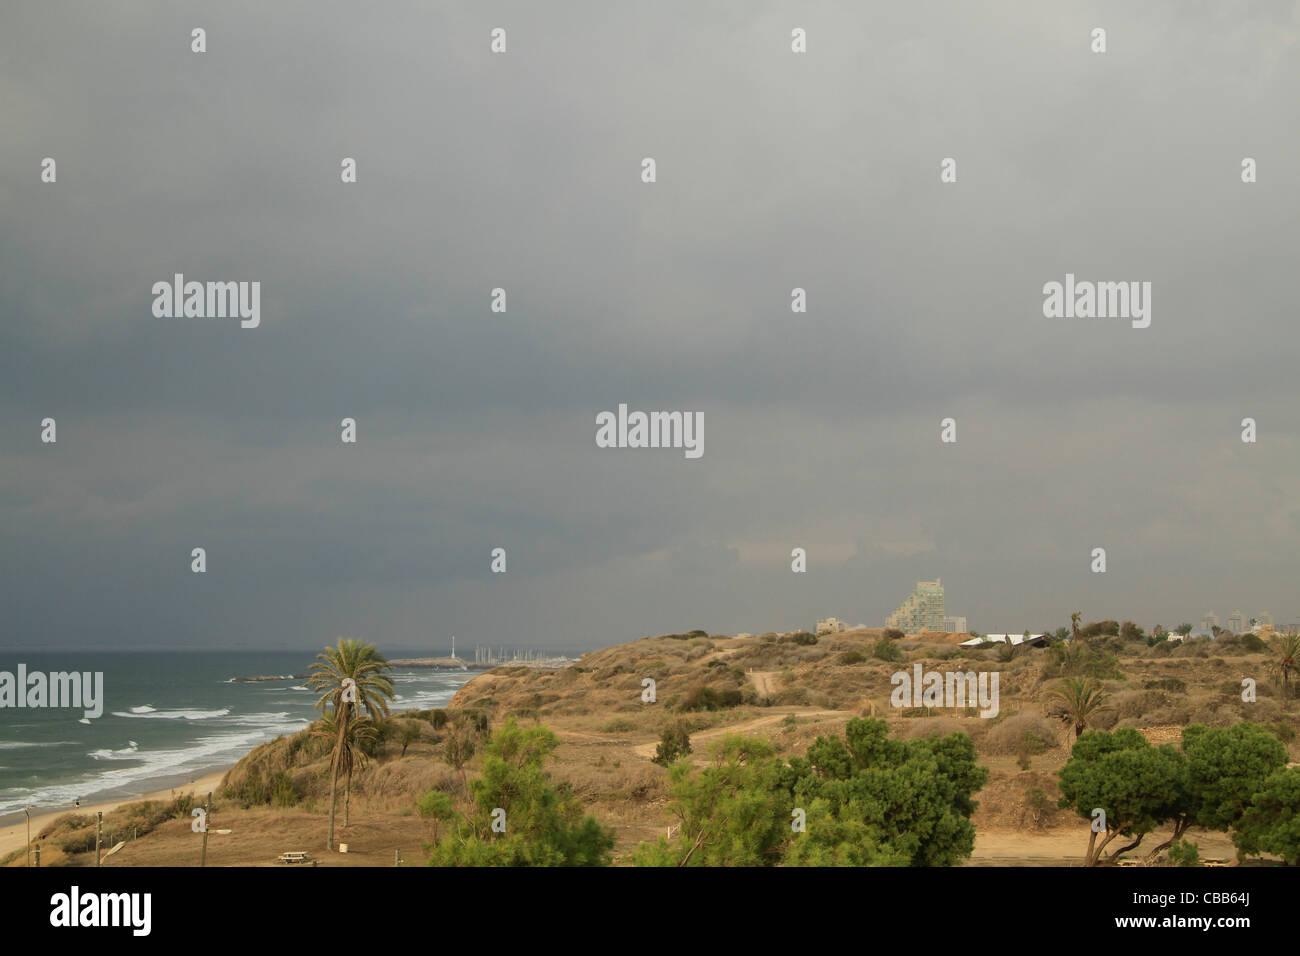 Israel, Coastal Plain, a view of Tel Ashkelon - Stock Image